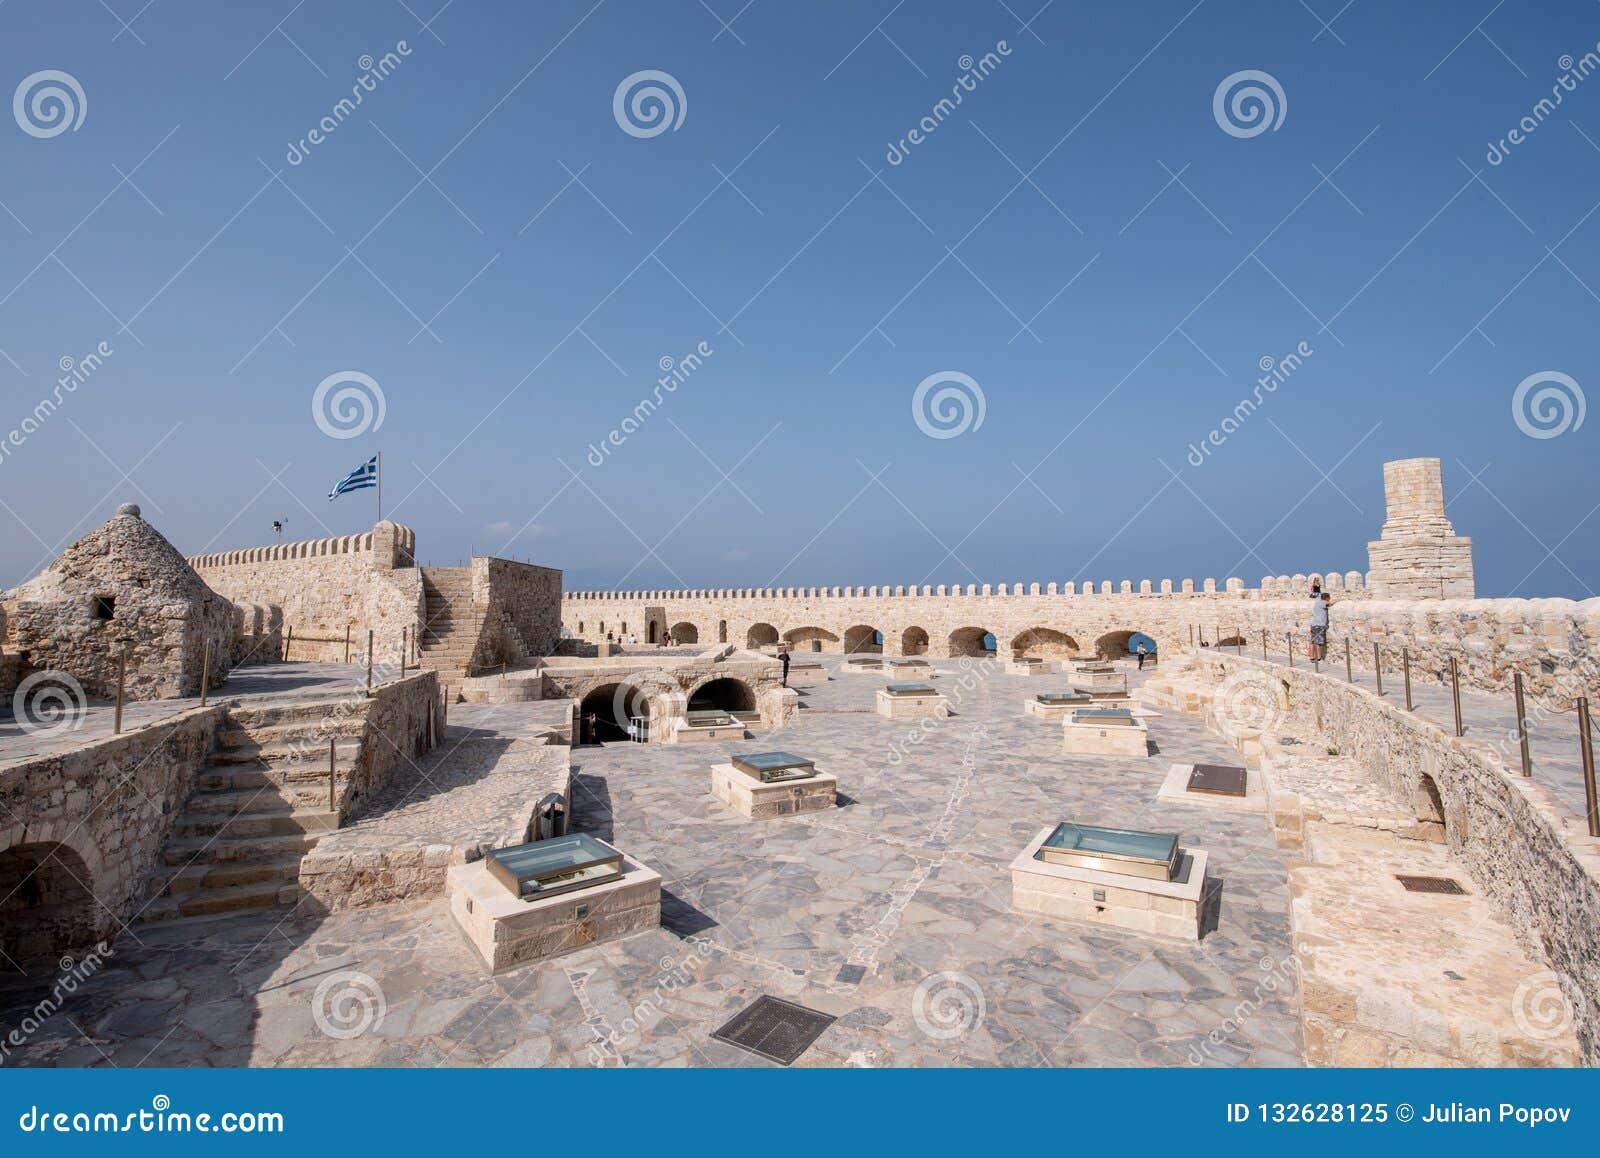 Fortaleza veneciana vieja en la ciudad de Heraklion, Creta de Koules Tapa v